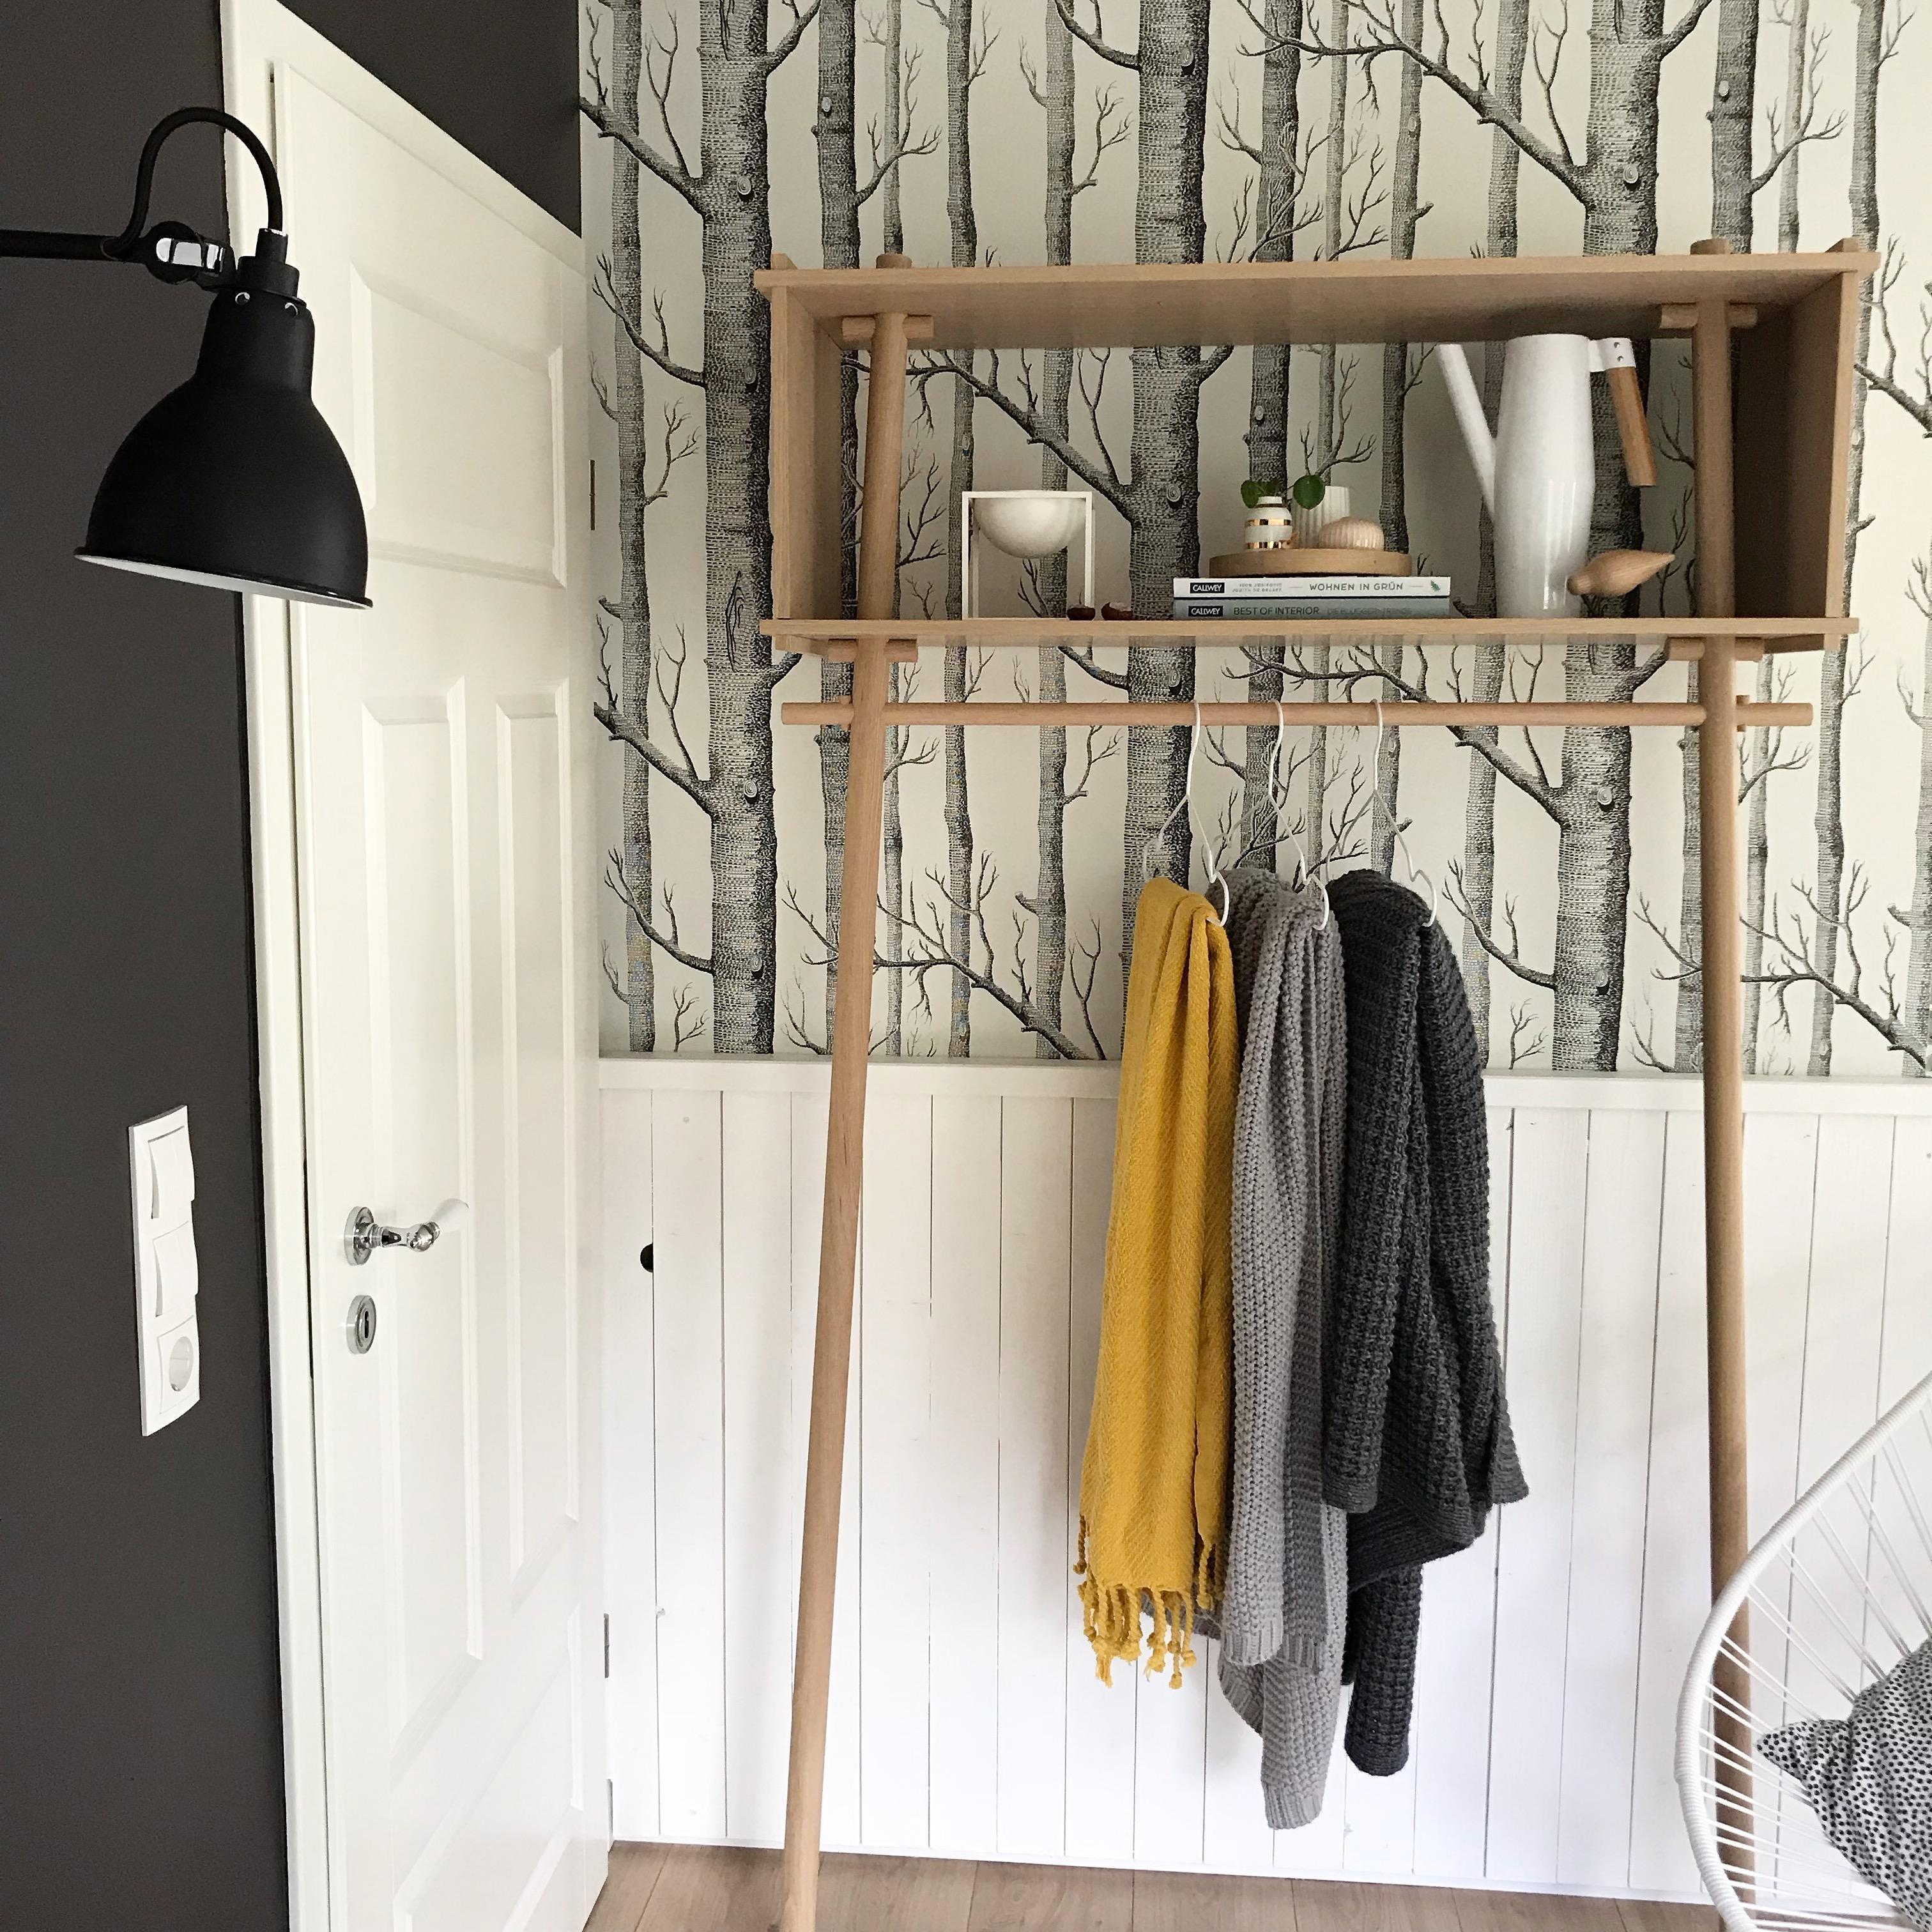 garderoben ideen so schaffst du stilvoll ordnung. Black Bedroom Furniture Sets. Home Design Ideas